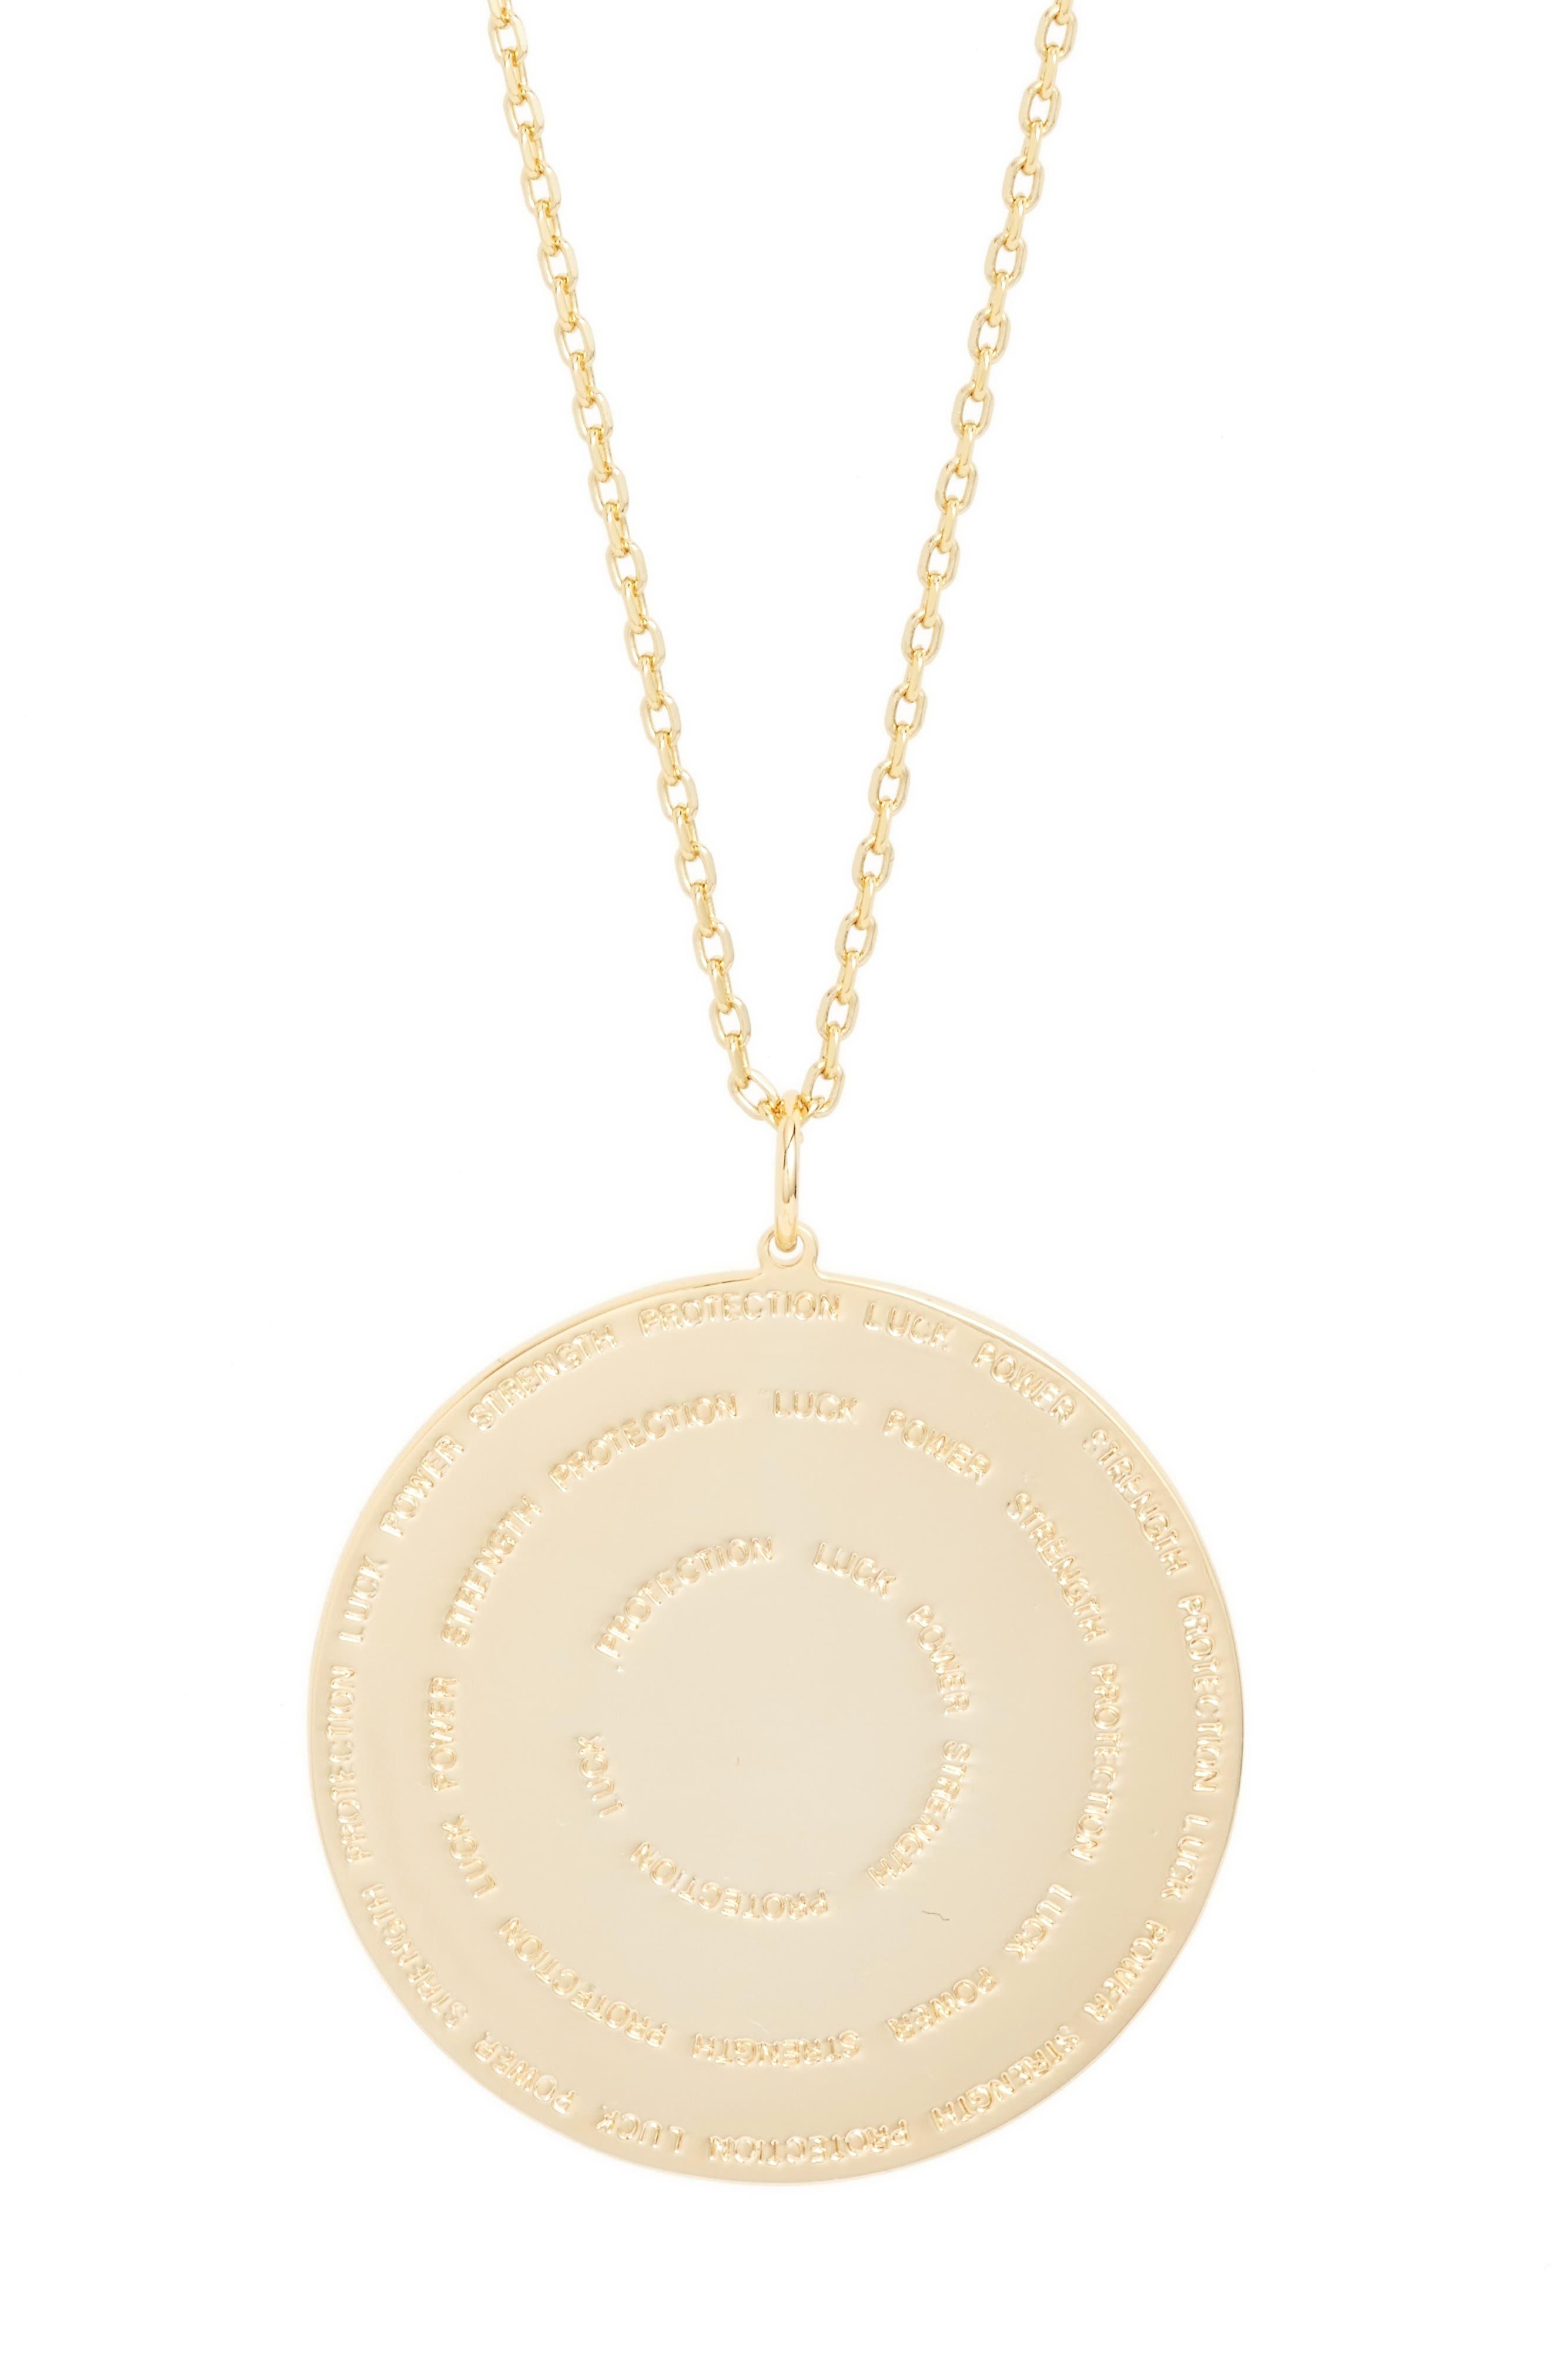 Hamsa Love Letters Pendant Necklace,                             Alternate thumbnail 4, color,                             Hamsa/ Gold